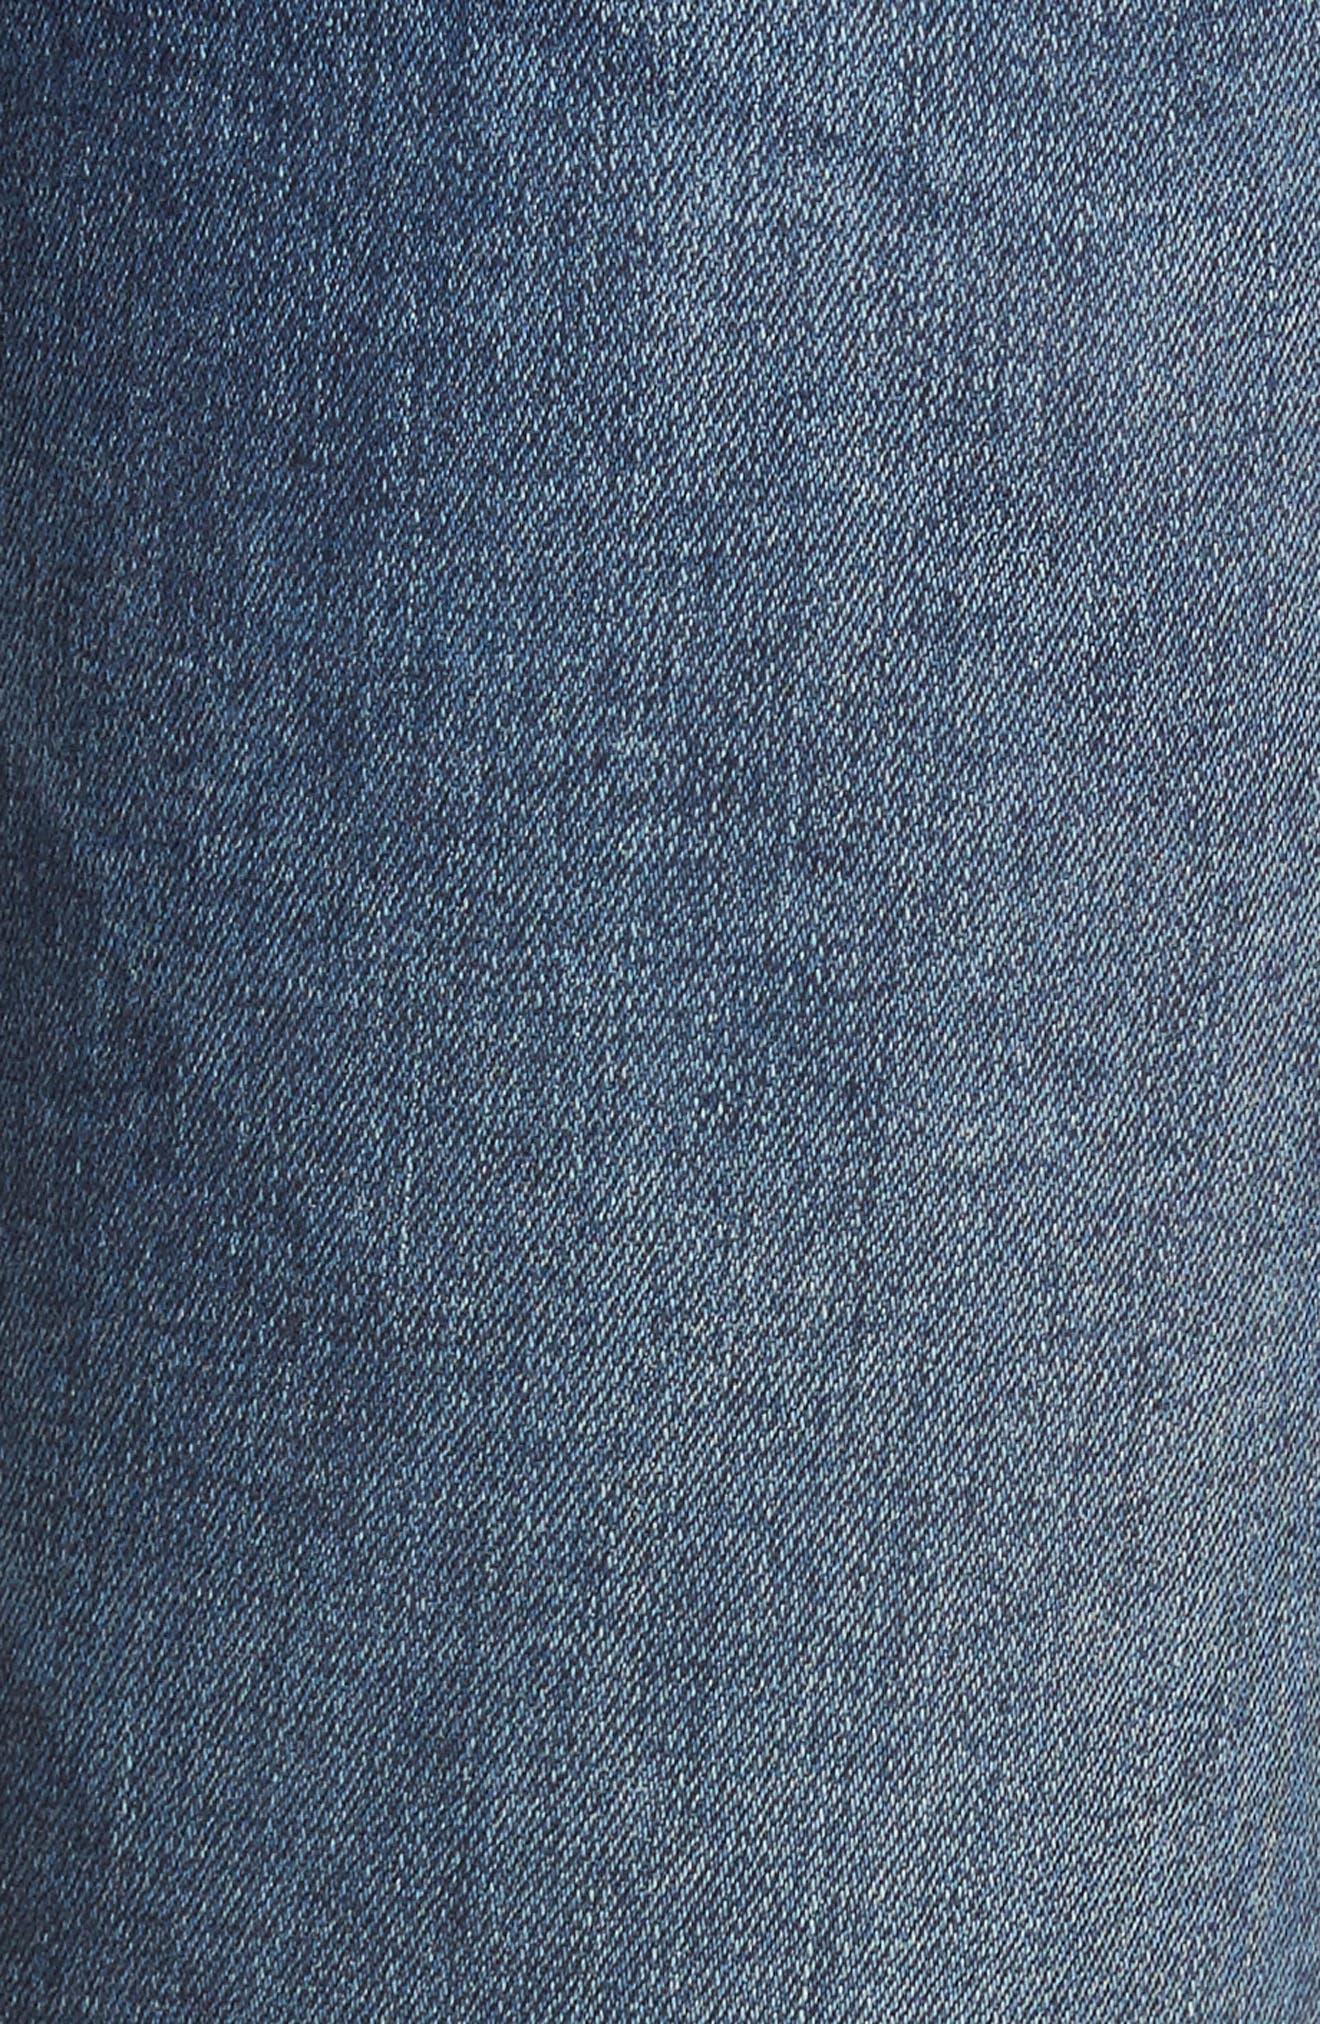 Tuxedo Stripe Ripped Skinny Jeans,                             Alternate thumbnail 5, color,                             400